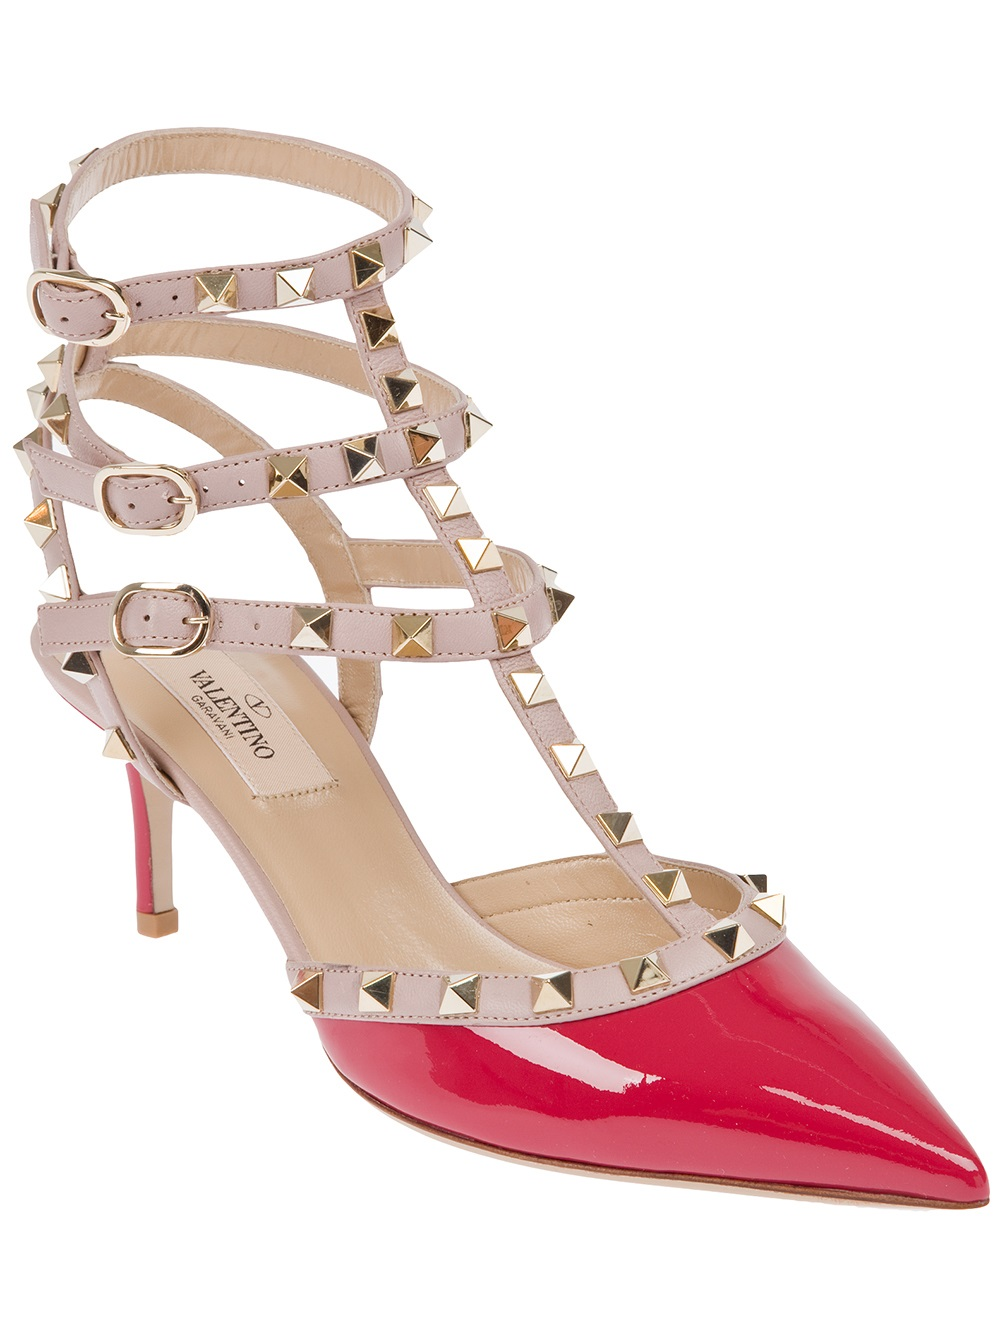 11fd532a0f76 Lyst - Valentino Valentino Rockstud Ankle Strap Pump in Pink